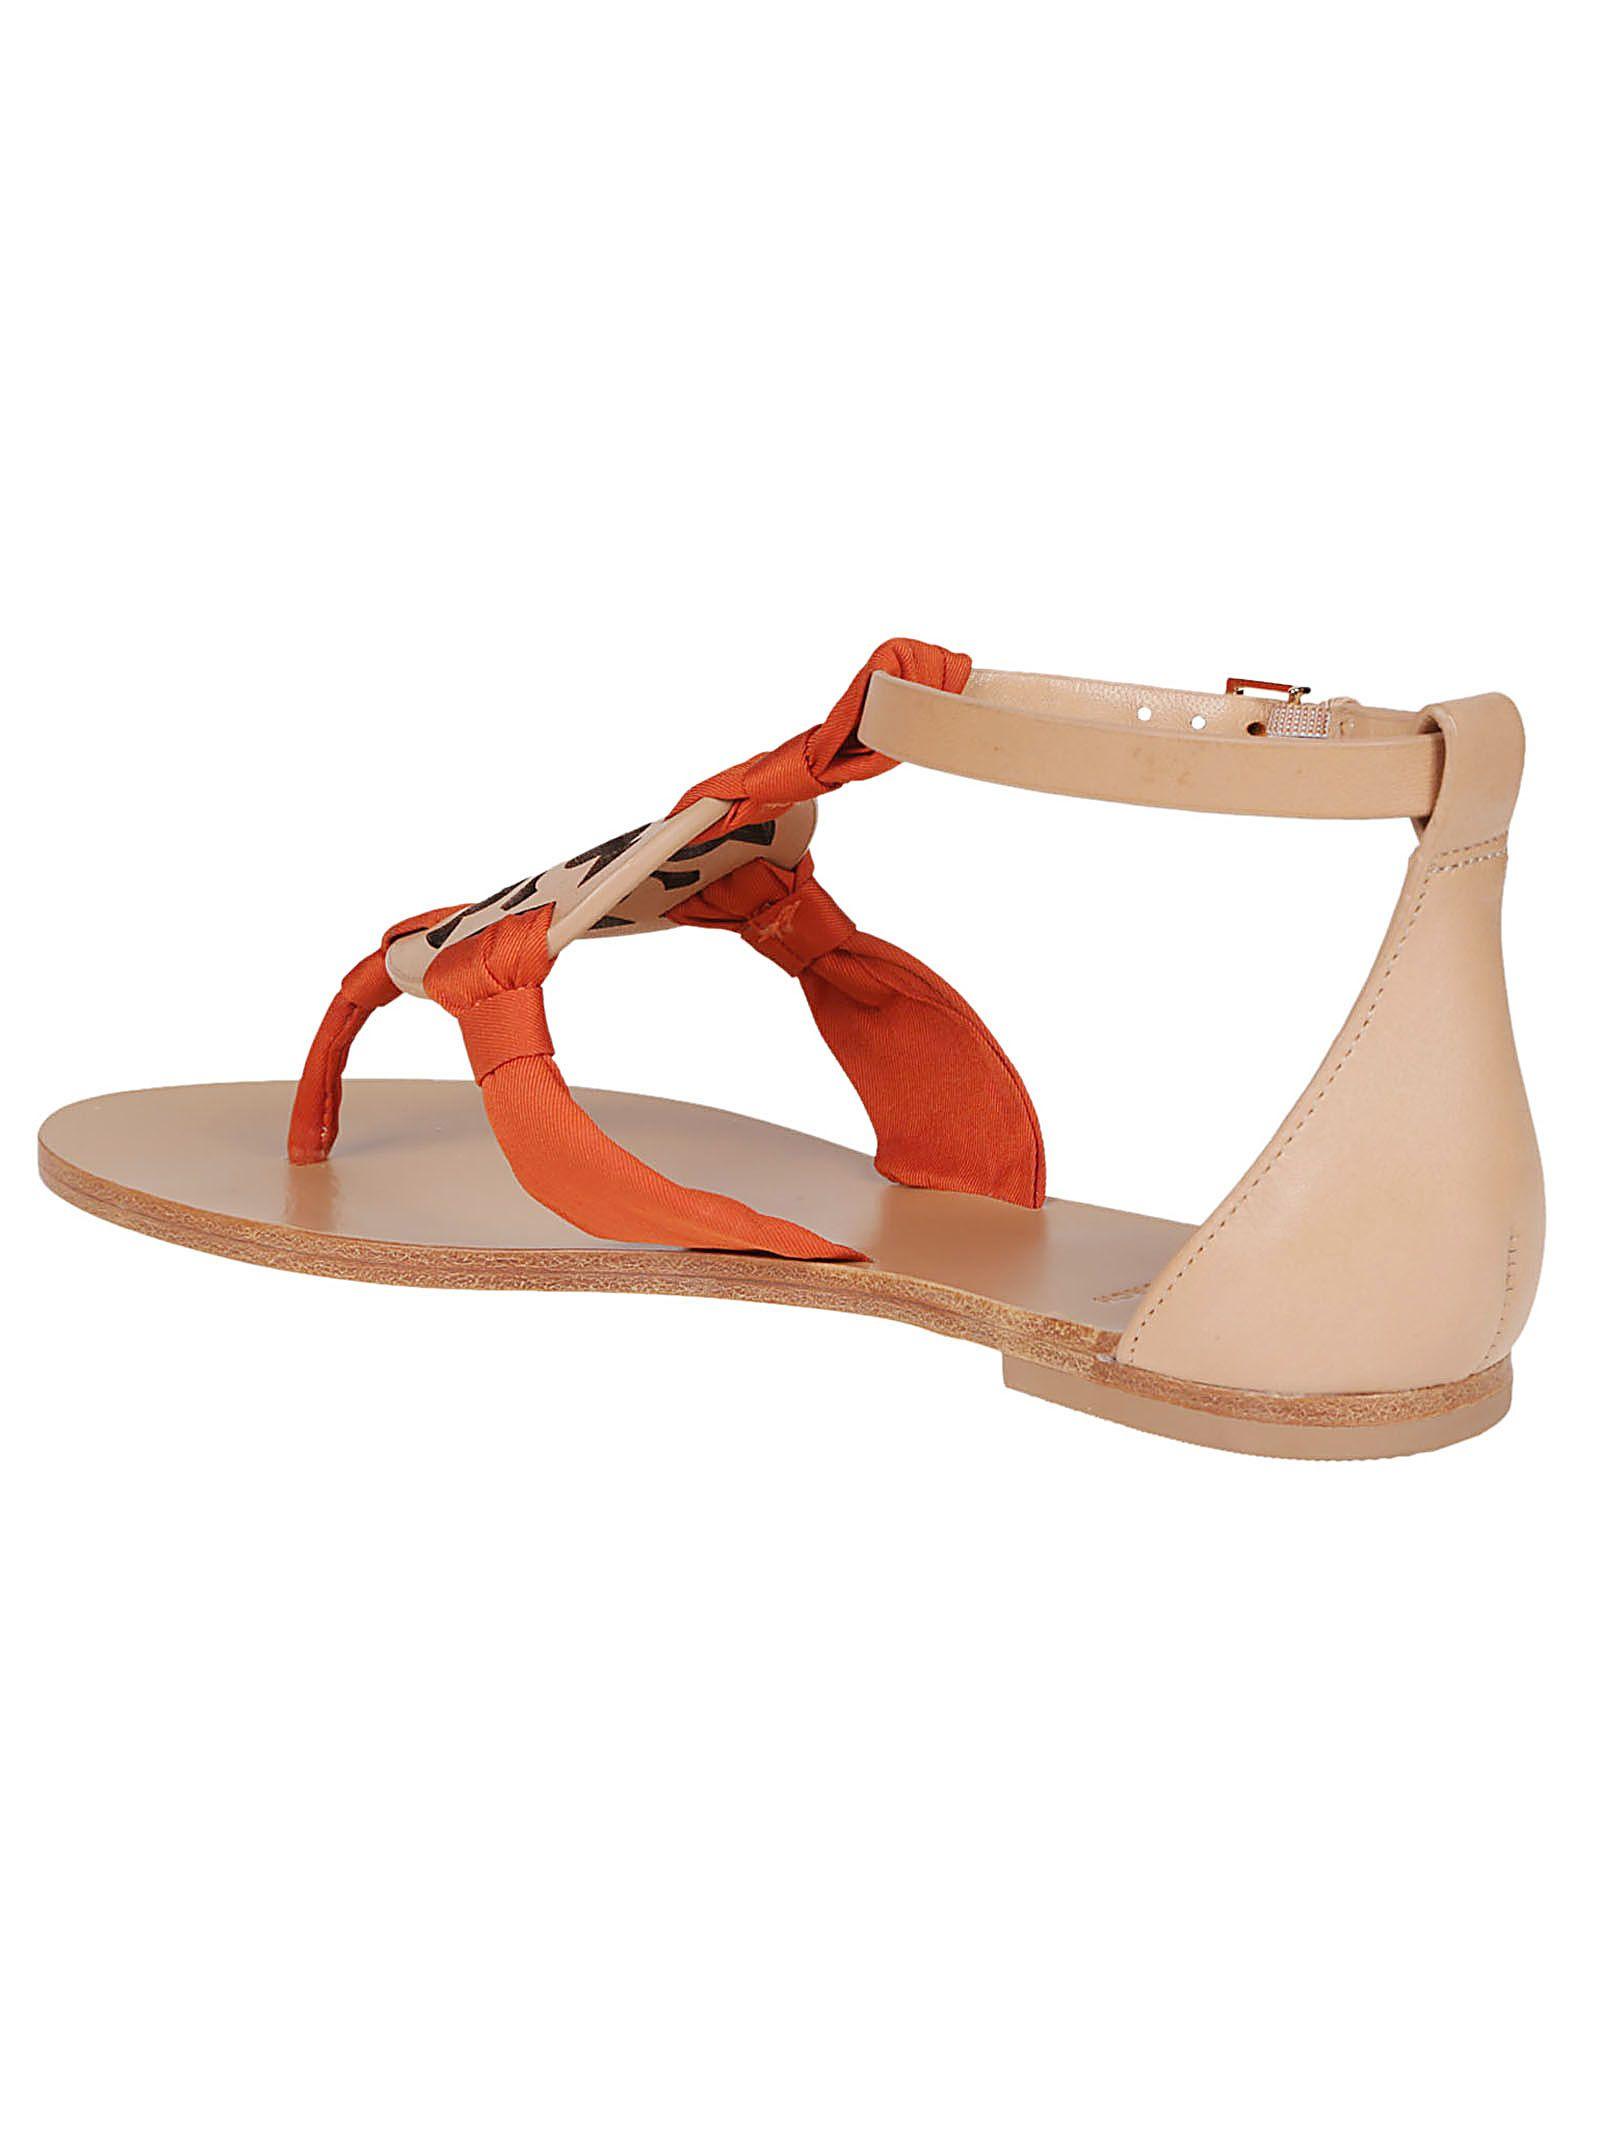 667bfd38f0b93c Tory Burch Tory Burch Classic Flat Sandals - Basic - 10827818